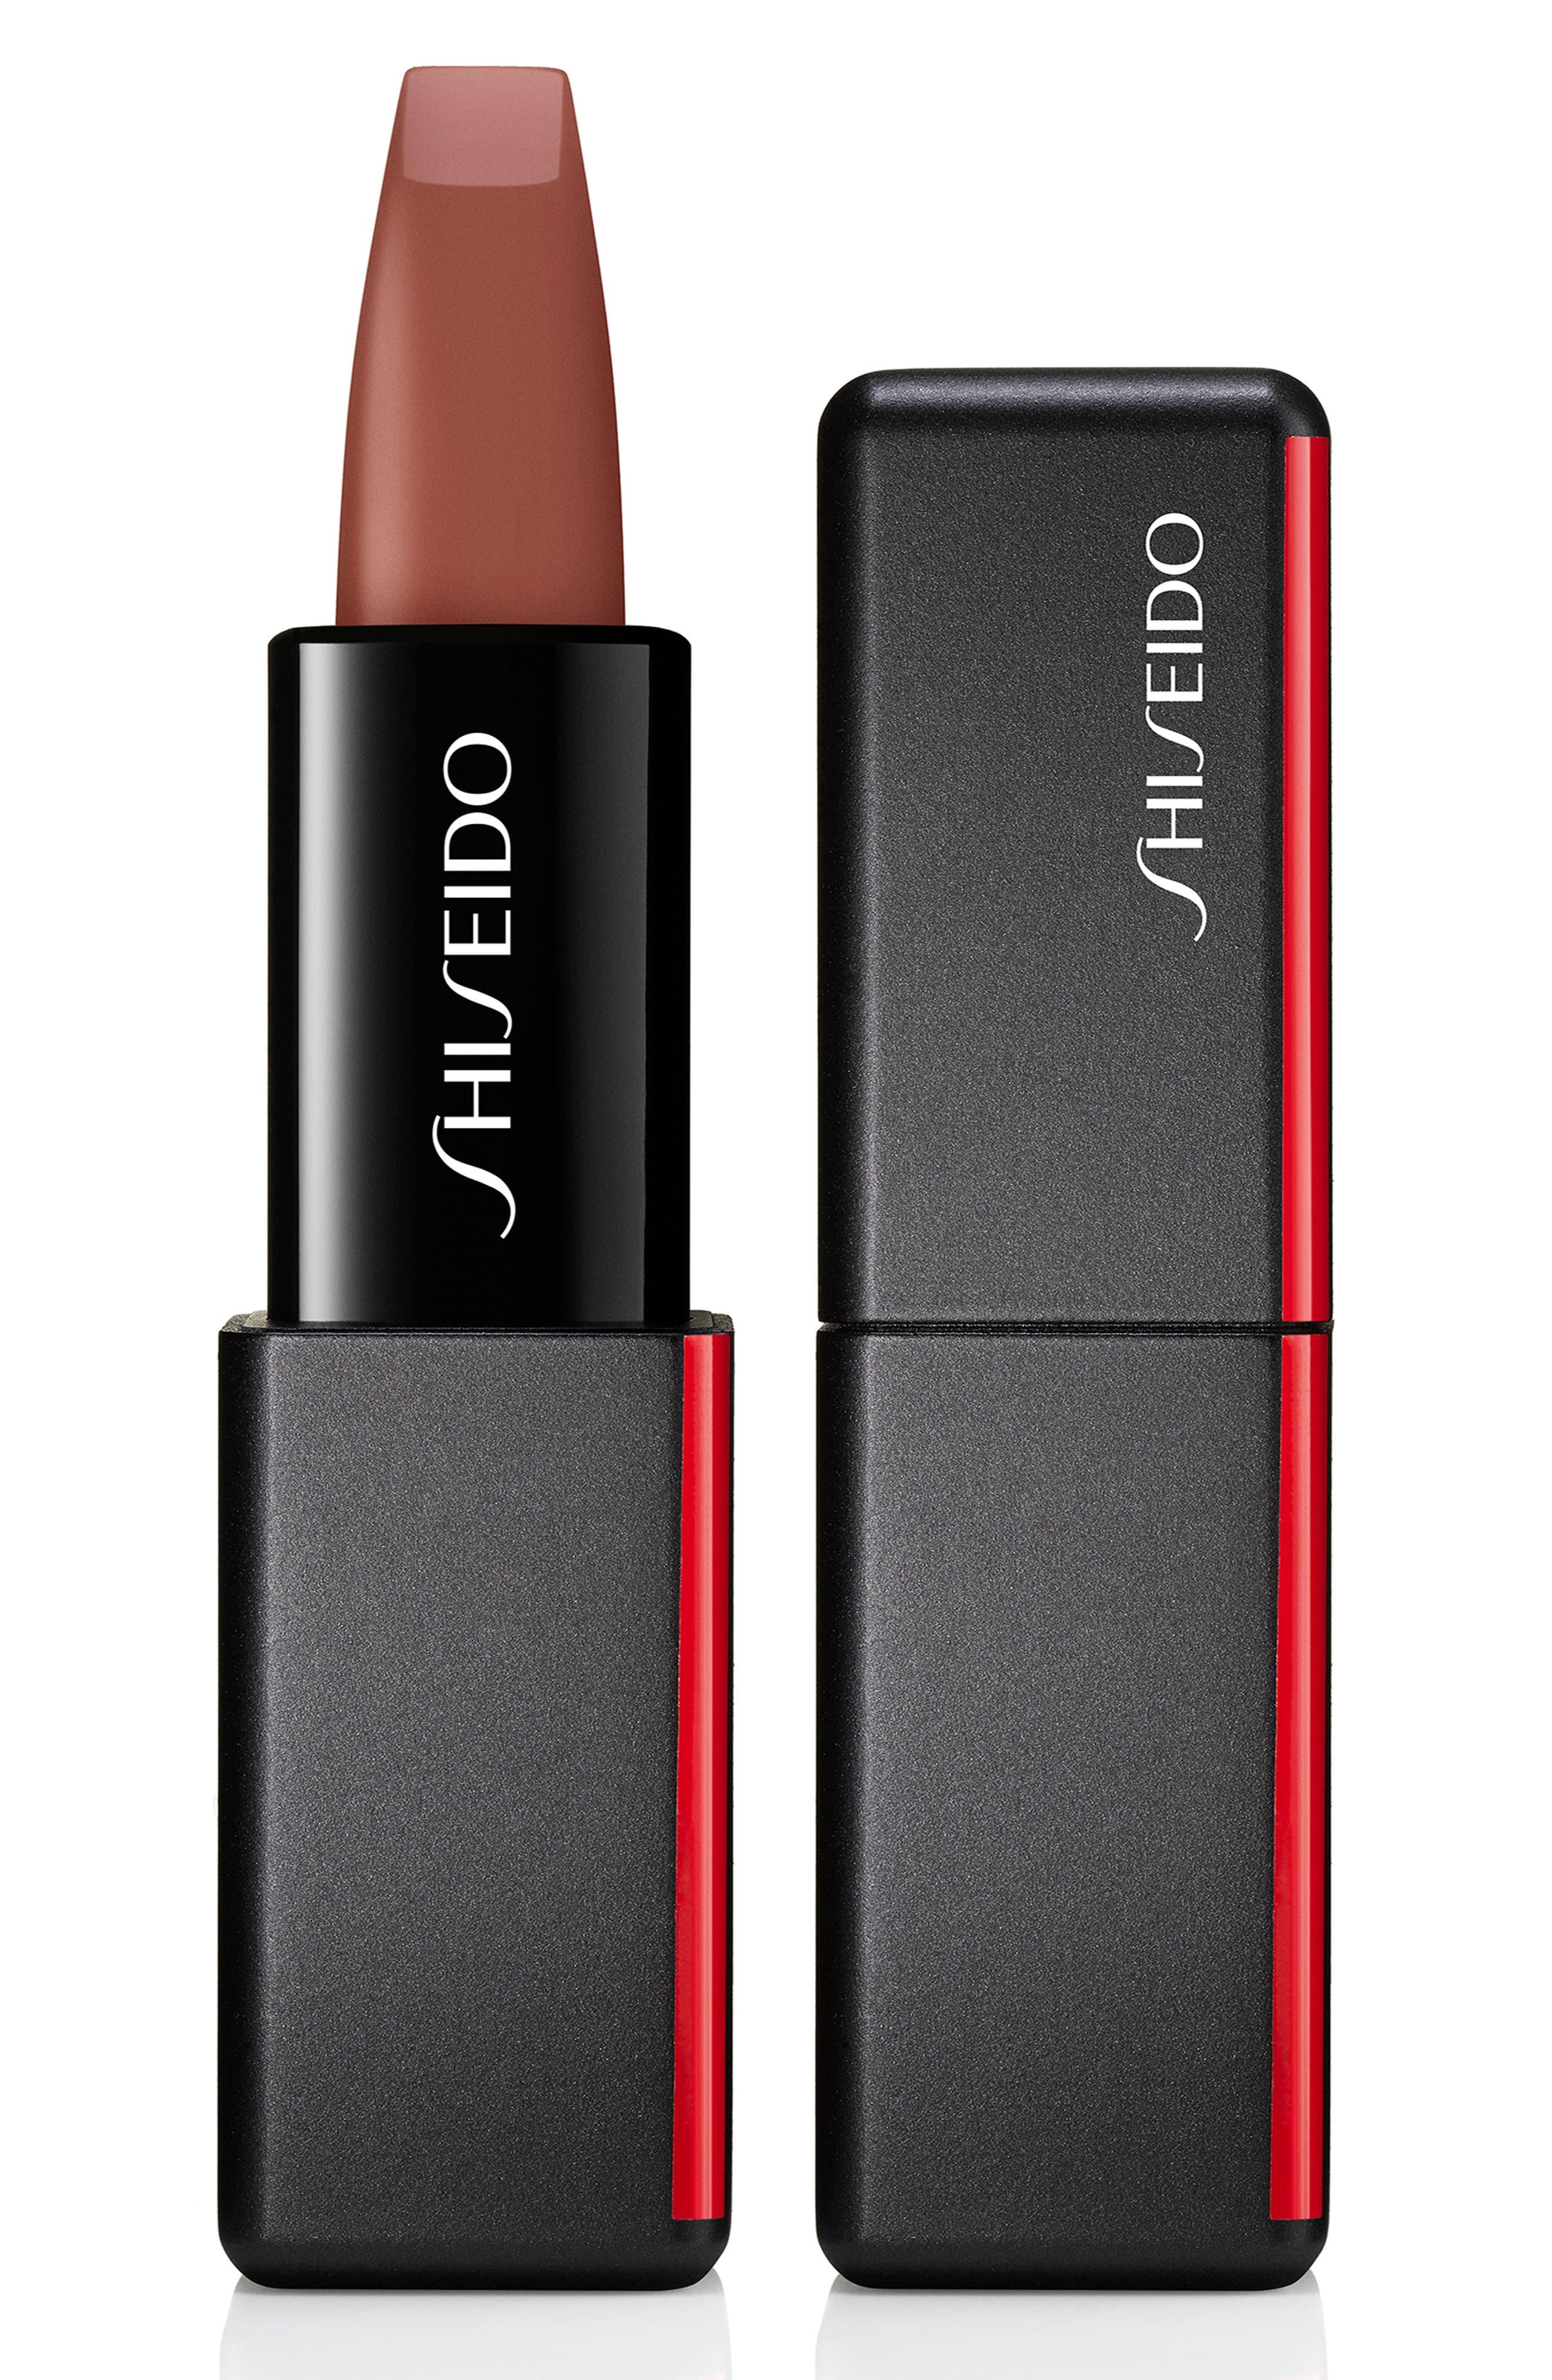 UPC 729238147836 product image for Shiseido Modern Matte Powder Lipstick - Murmur | upcitemdb.com